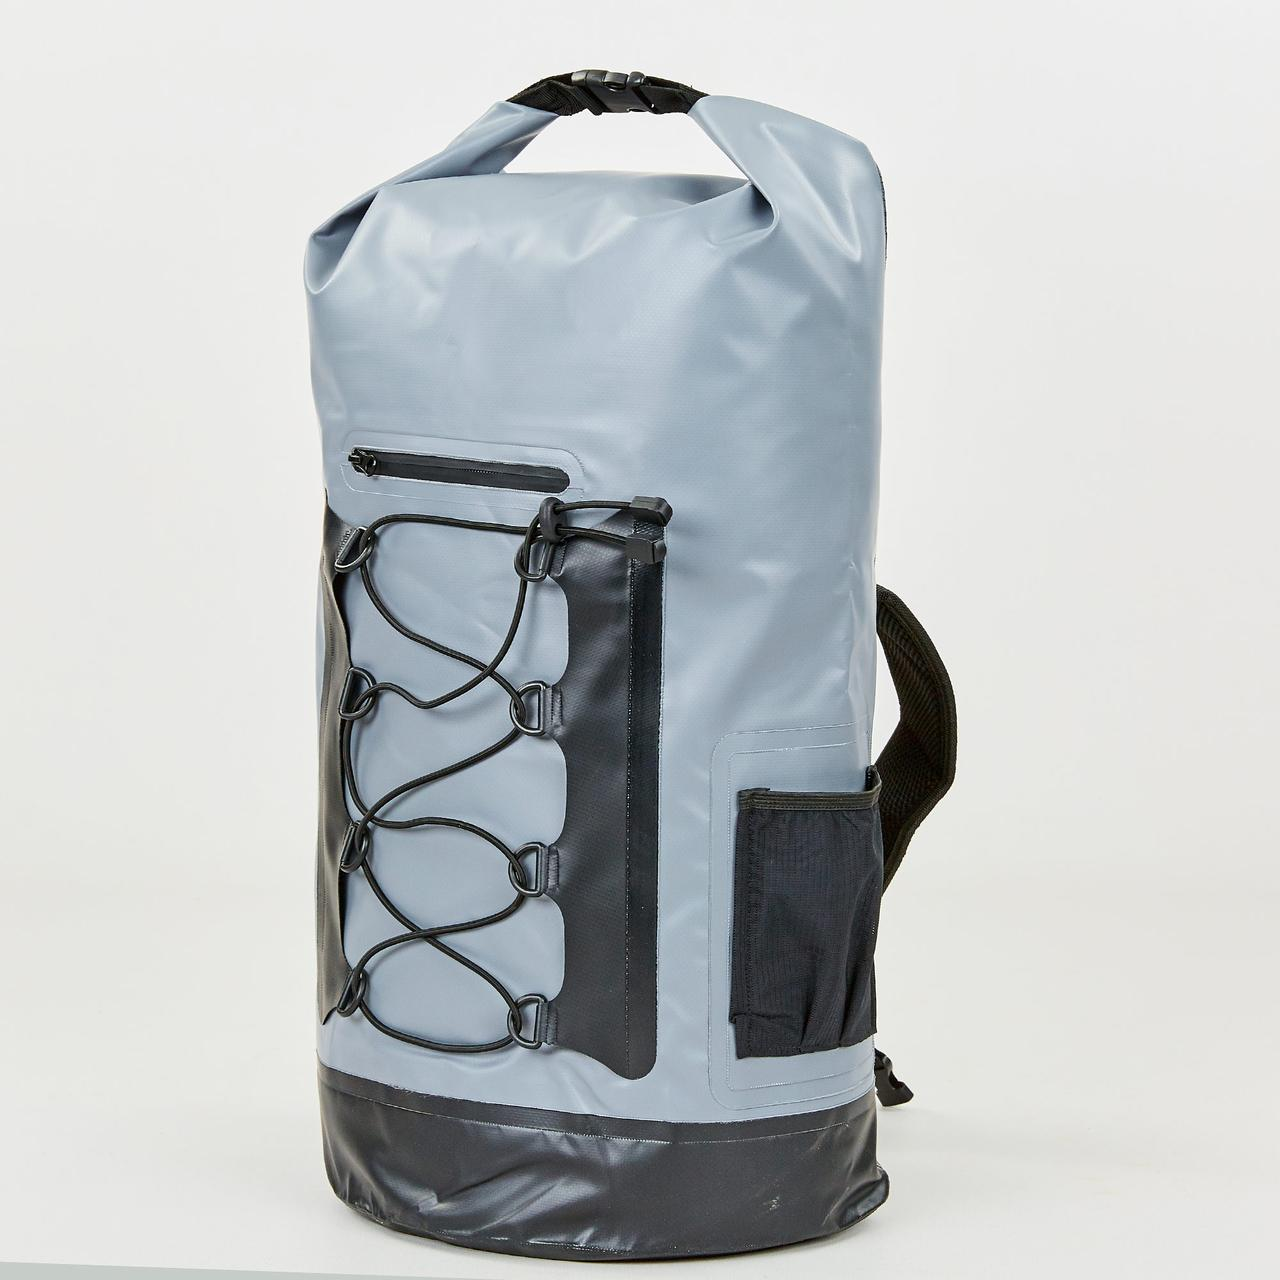 Водонепроницаемый рюкзак 28л TY-0381-28 (PVC, серый-черный)